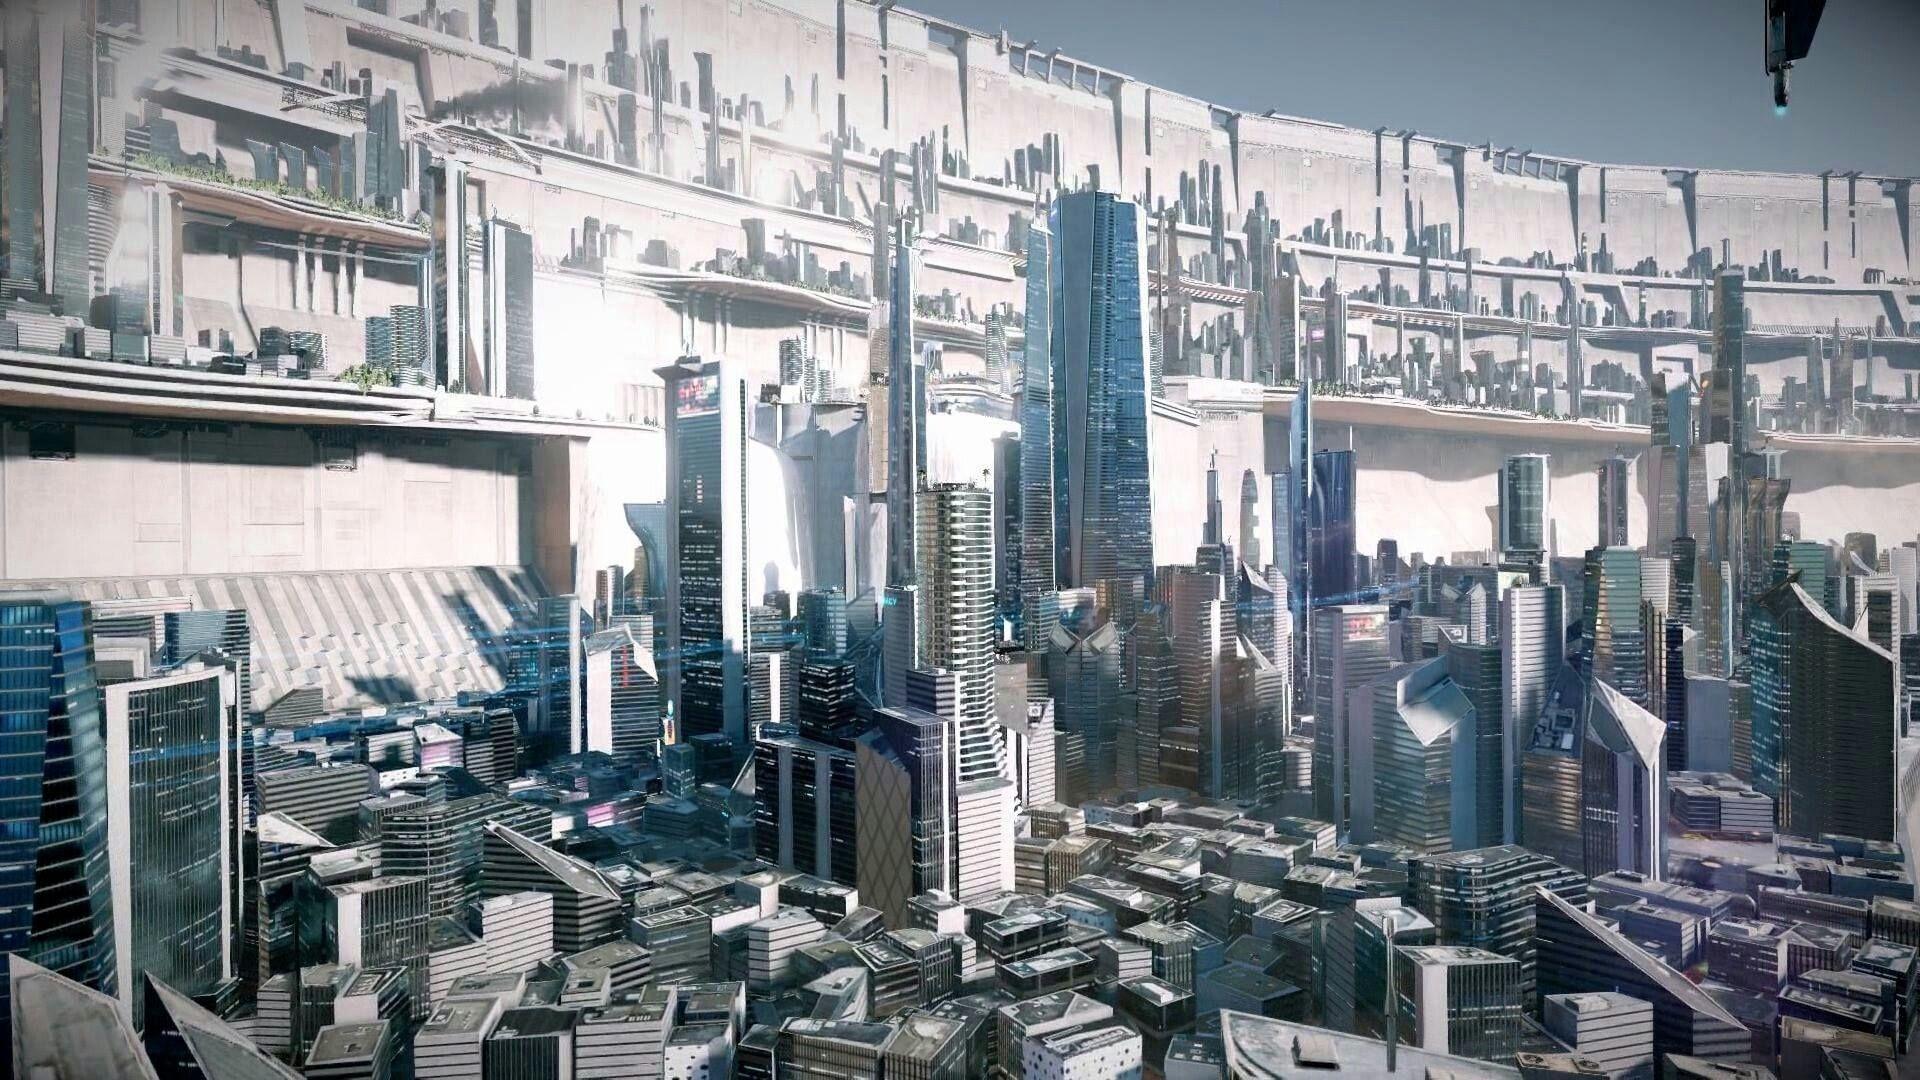 Pin By Dante Close On Sci Fi City Concept Art Futuristic City Sci Fi Concept Art Scifi Fantasy Art